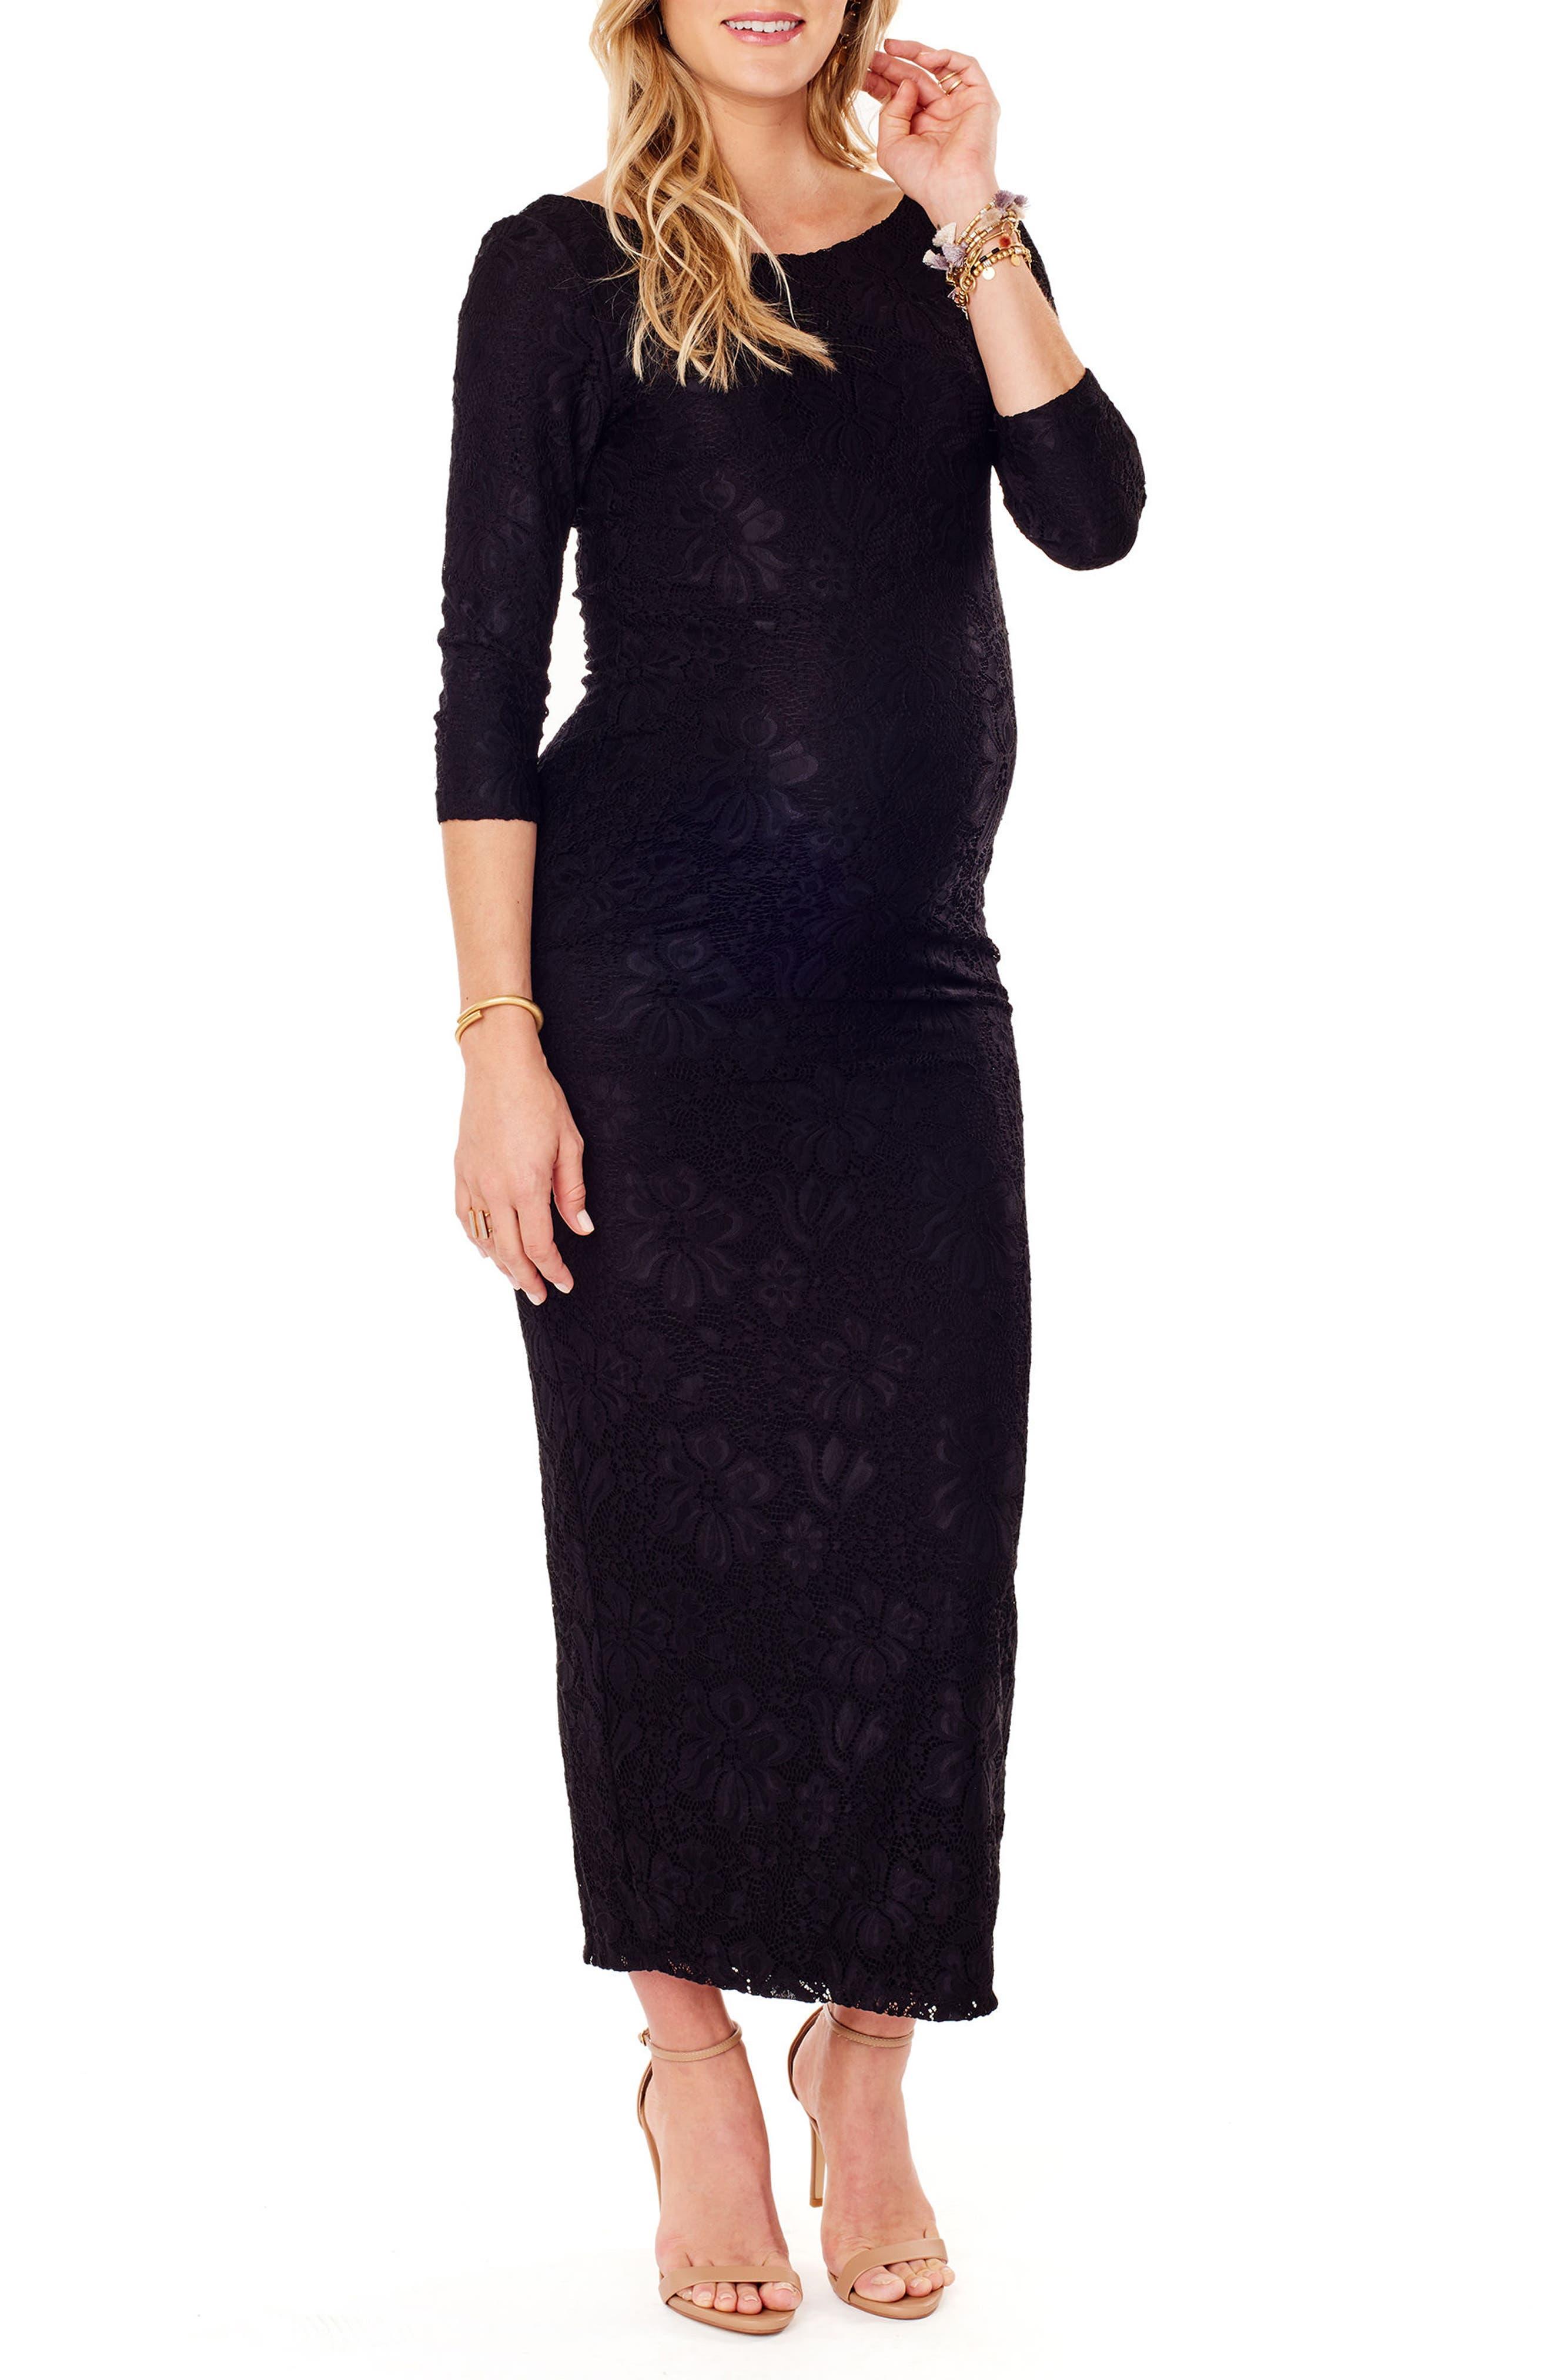 Ingrid & Isabel Lace Column Maternity Maxi Dress